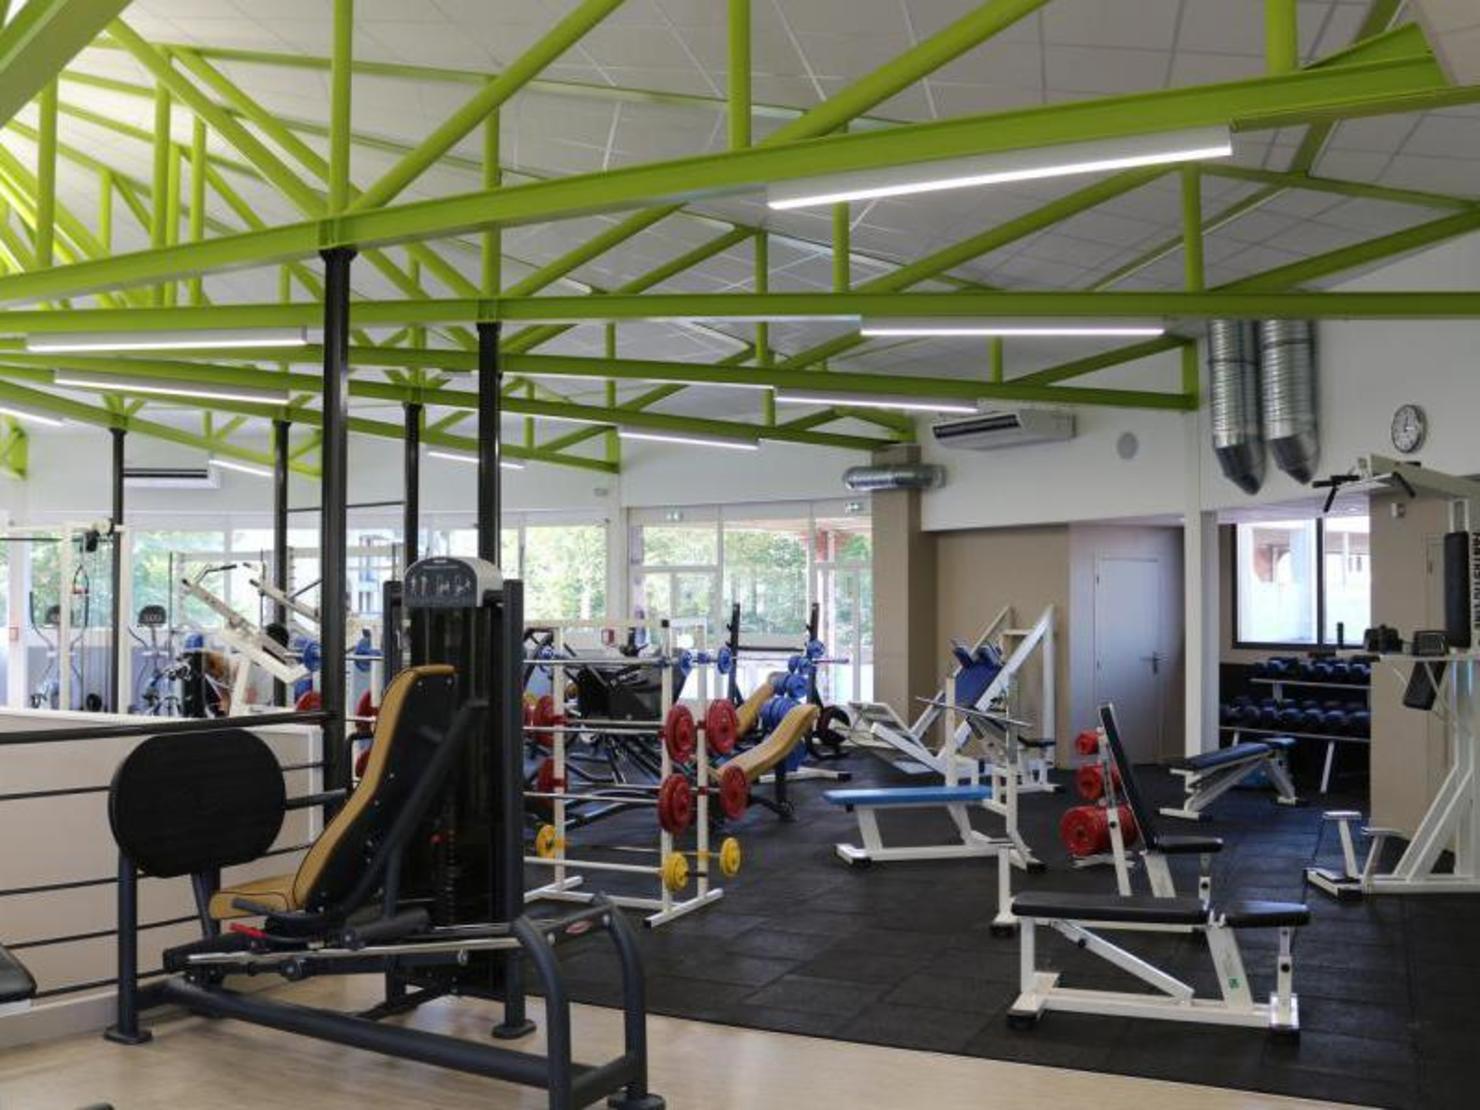 ovalie fitness colomiers tarifs avis